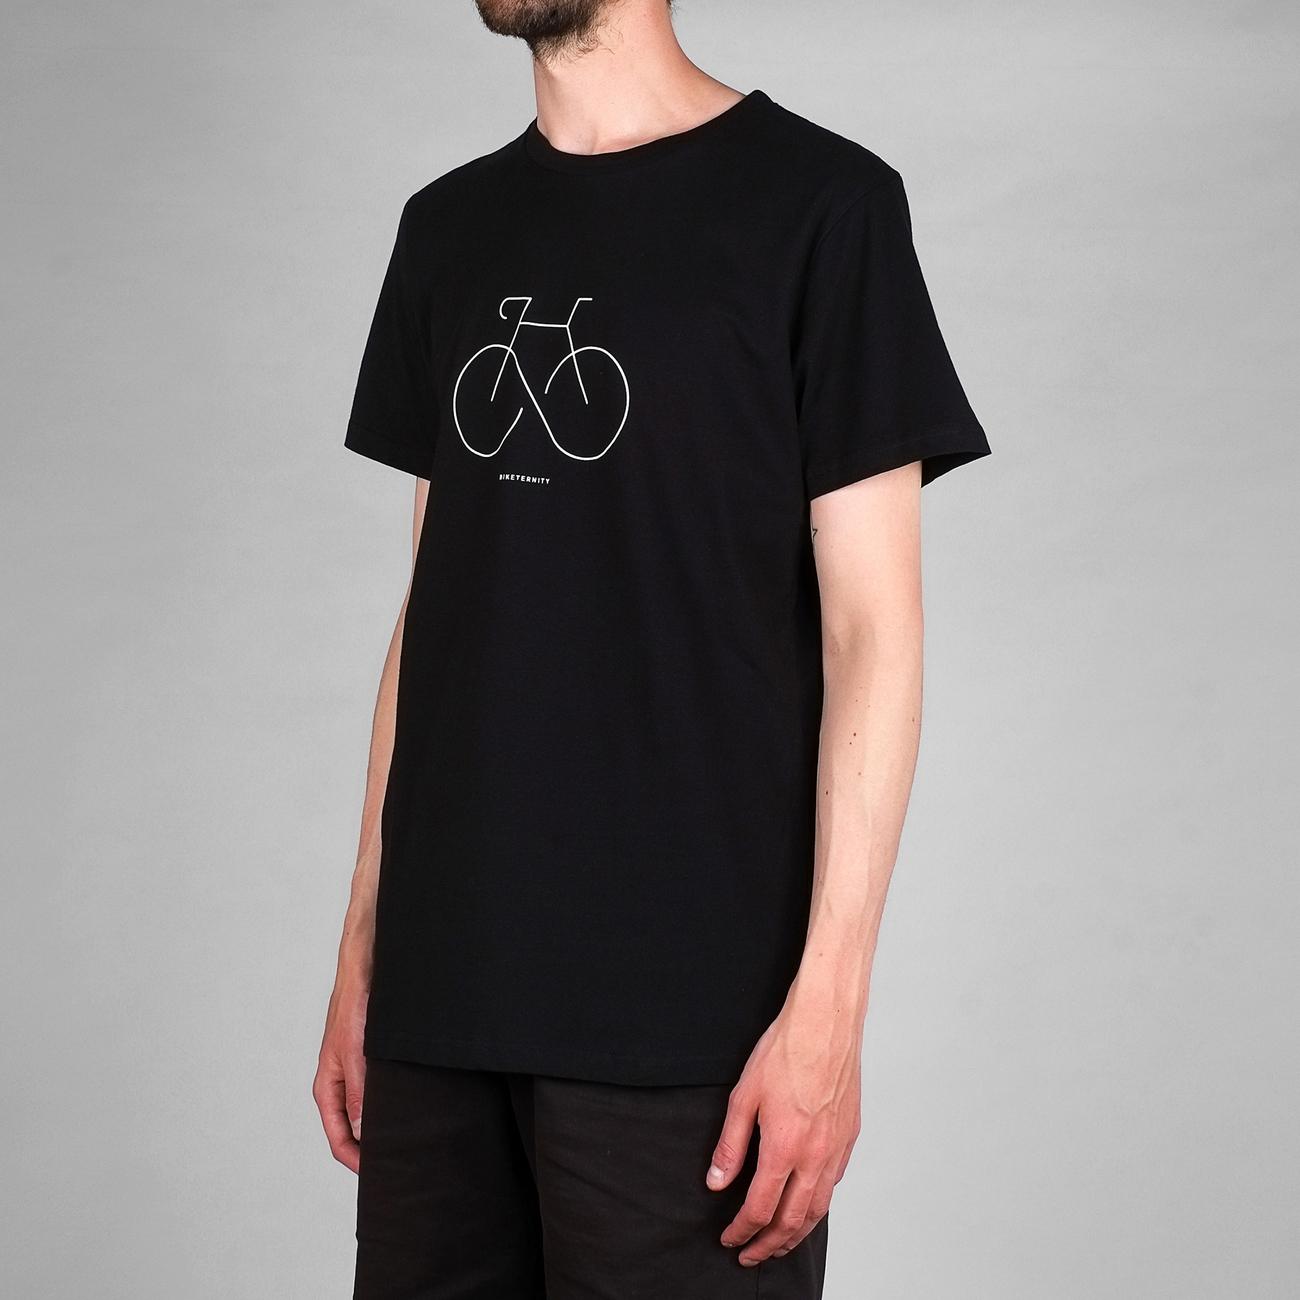 T-shirt Stockholm Biketernity Black